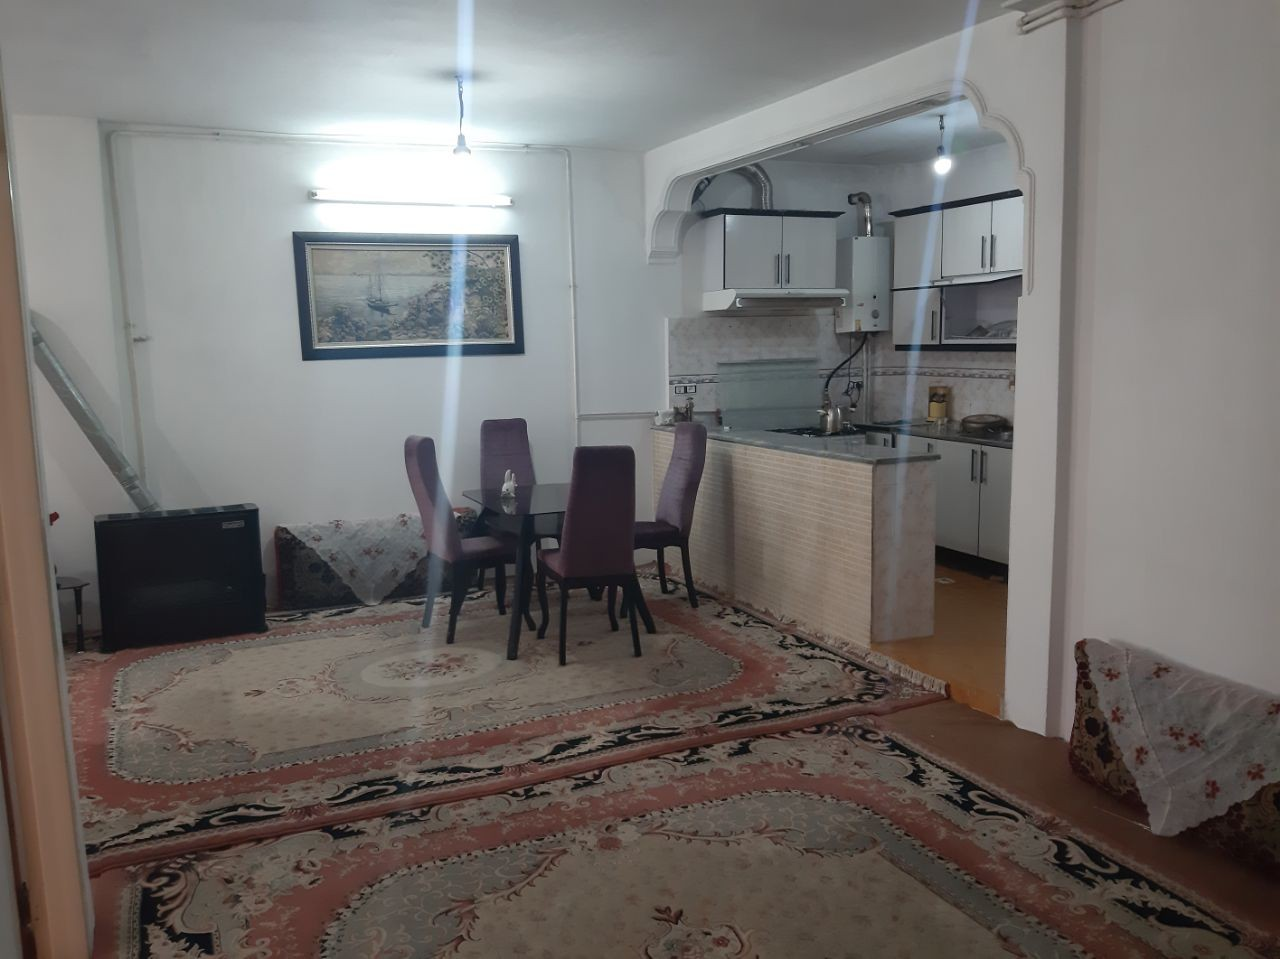 شهری سوئیت مبله در نقلاب اراک - 1